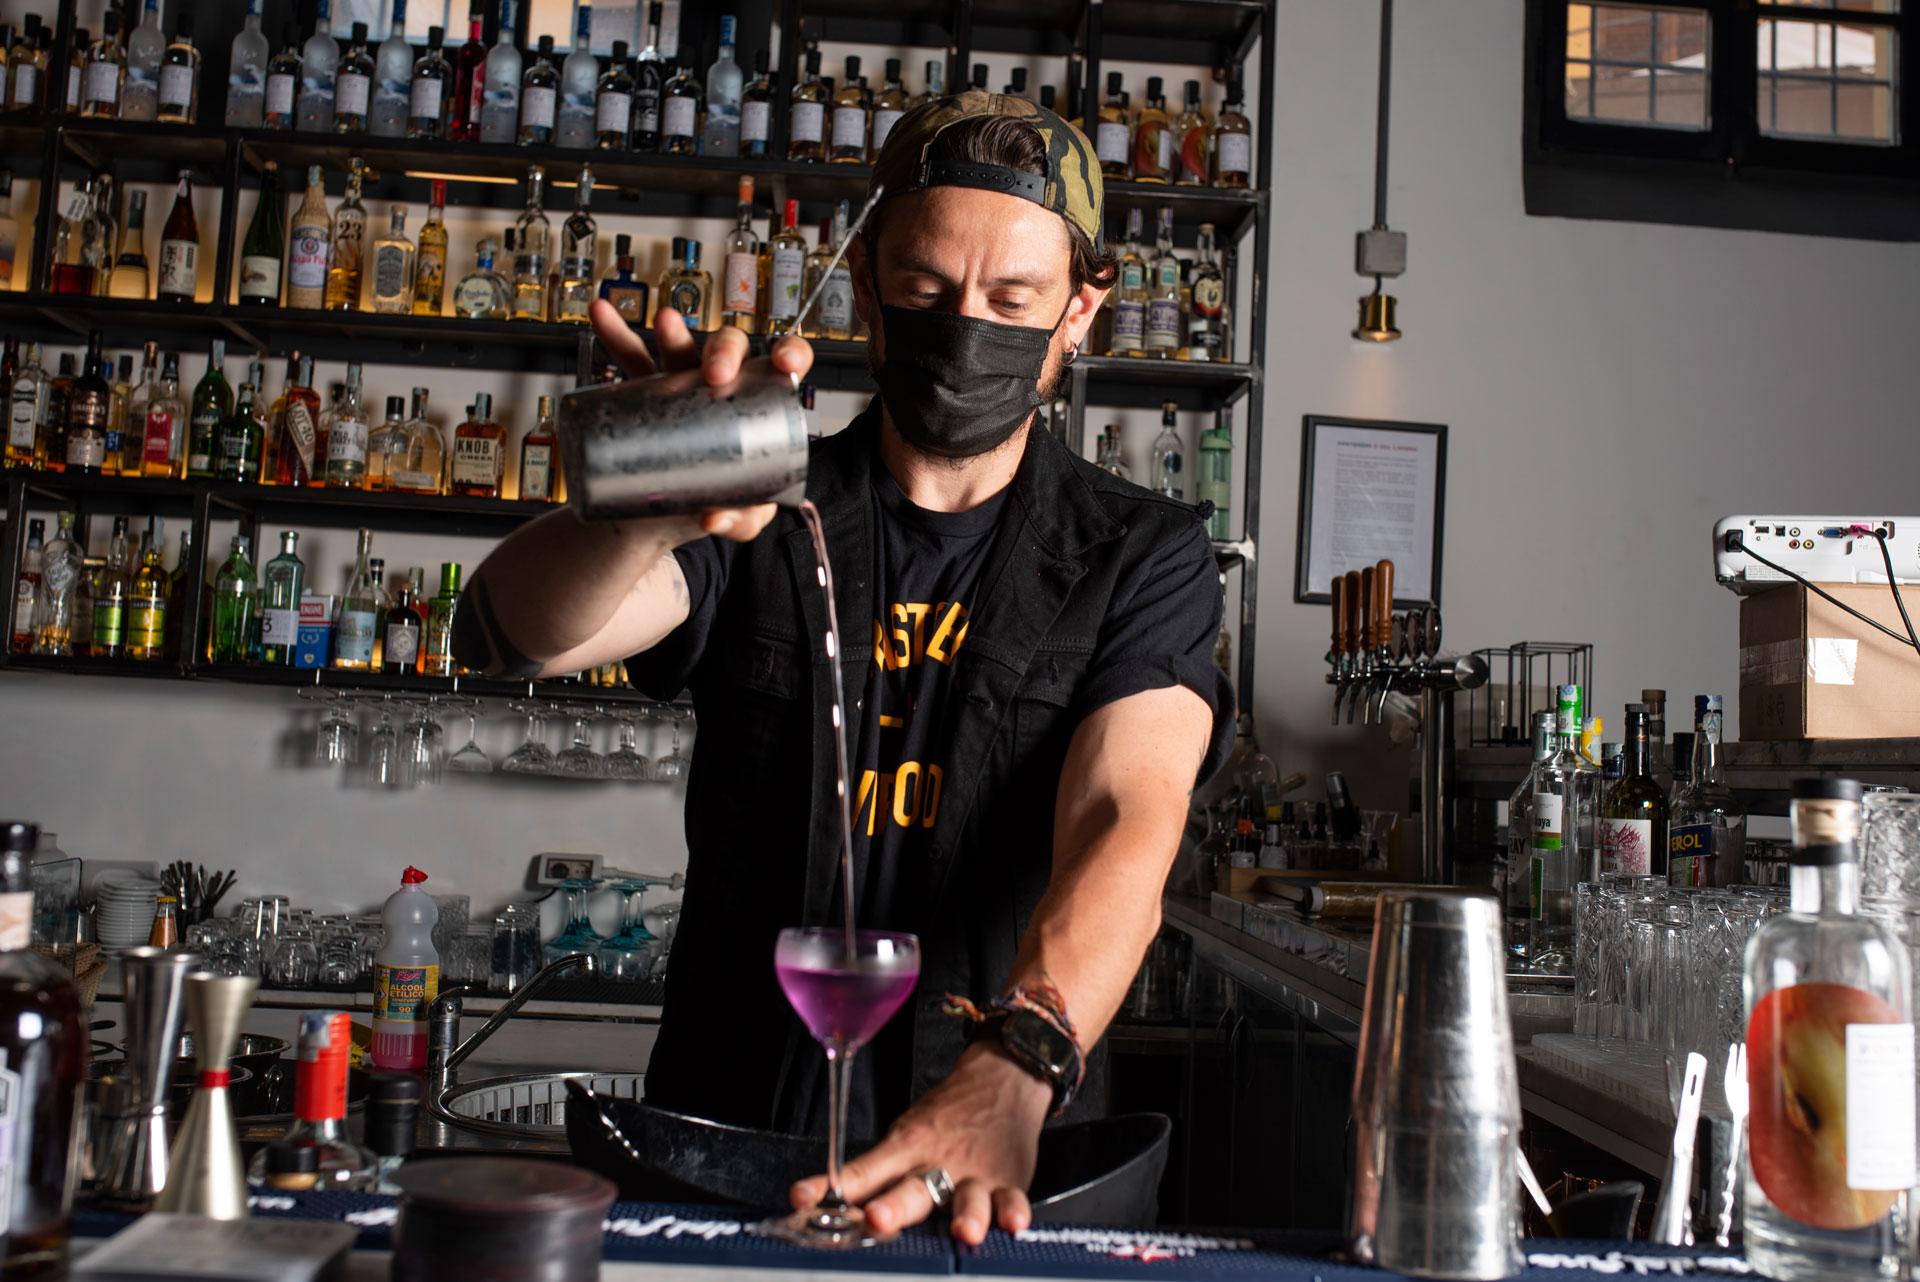 officina-visiva-lab-restaurant-riccardo-rosii-freni-e-frizioni-evento-drink-photographer-02